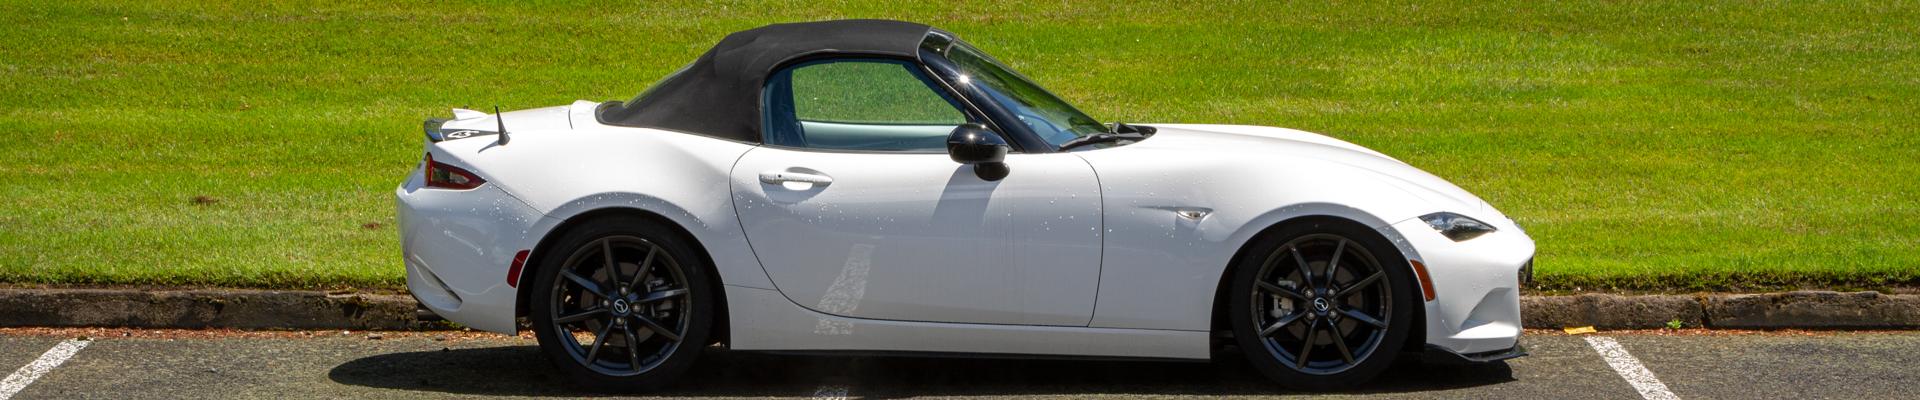 Pick Your Car - Mazda - MX-5 Miata - Page 1 - CravenSpeed com